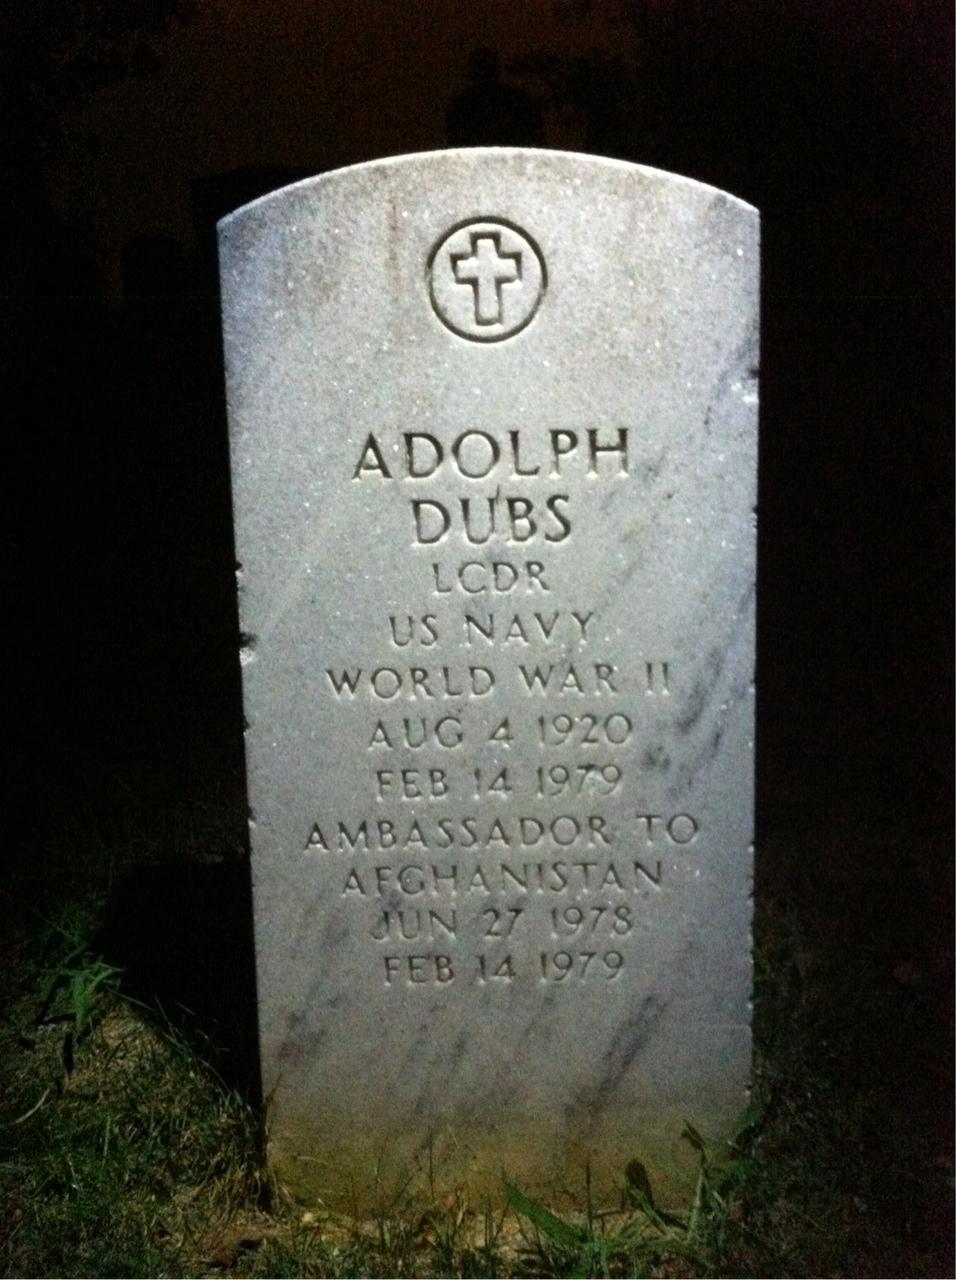 File:ANCExplorer Adolph Dubs grave.jpg - Wikimedia Commons